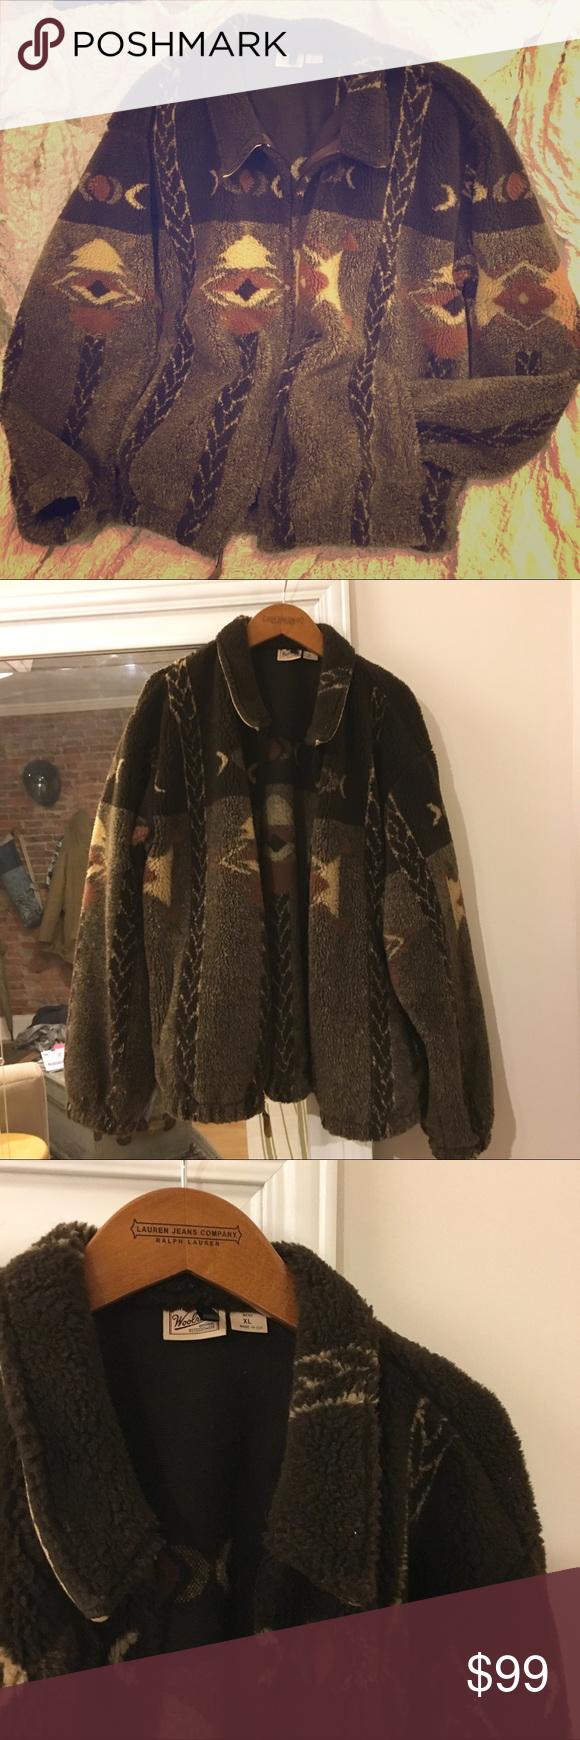 Vintage woolrich fluffy southwestern fleece zip up zip and cozy